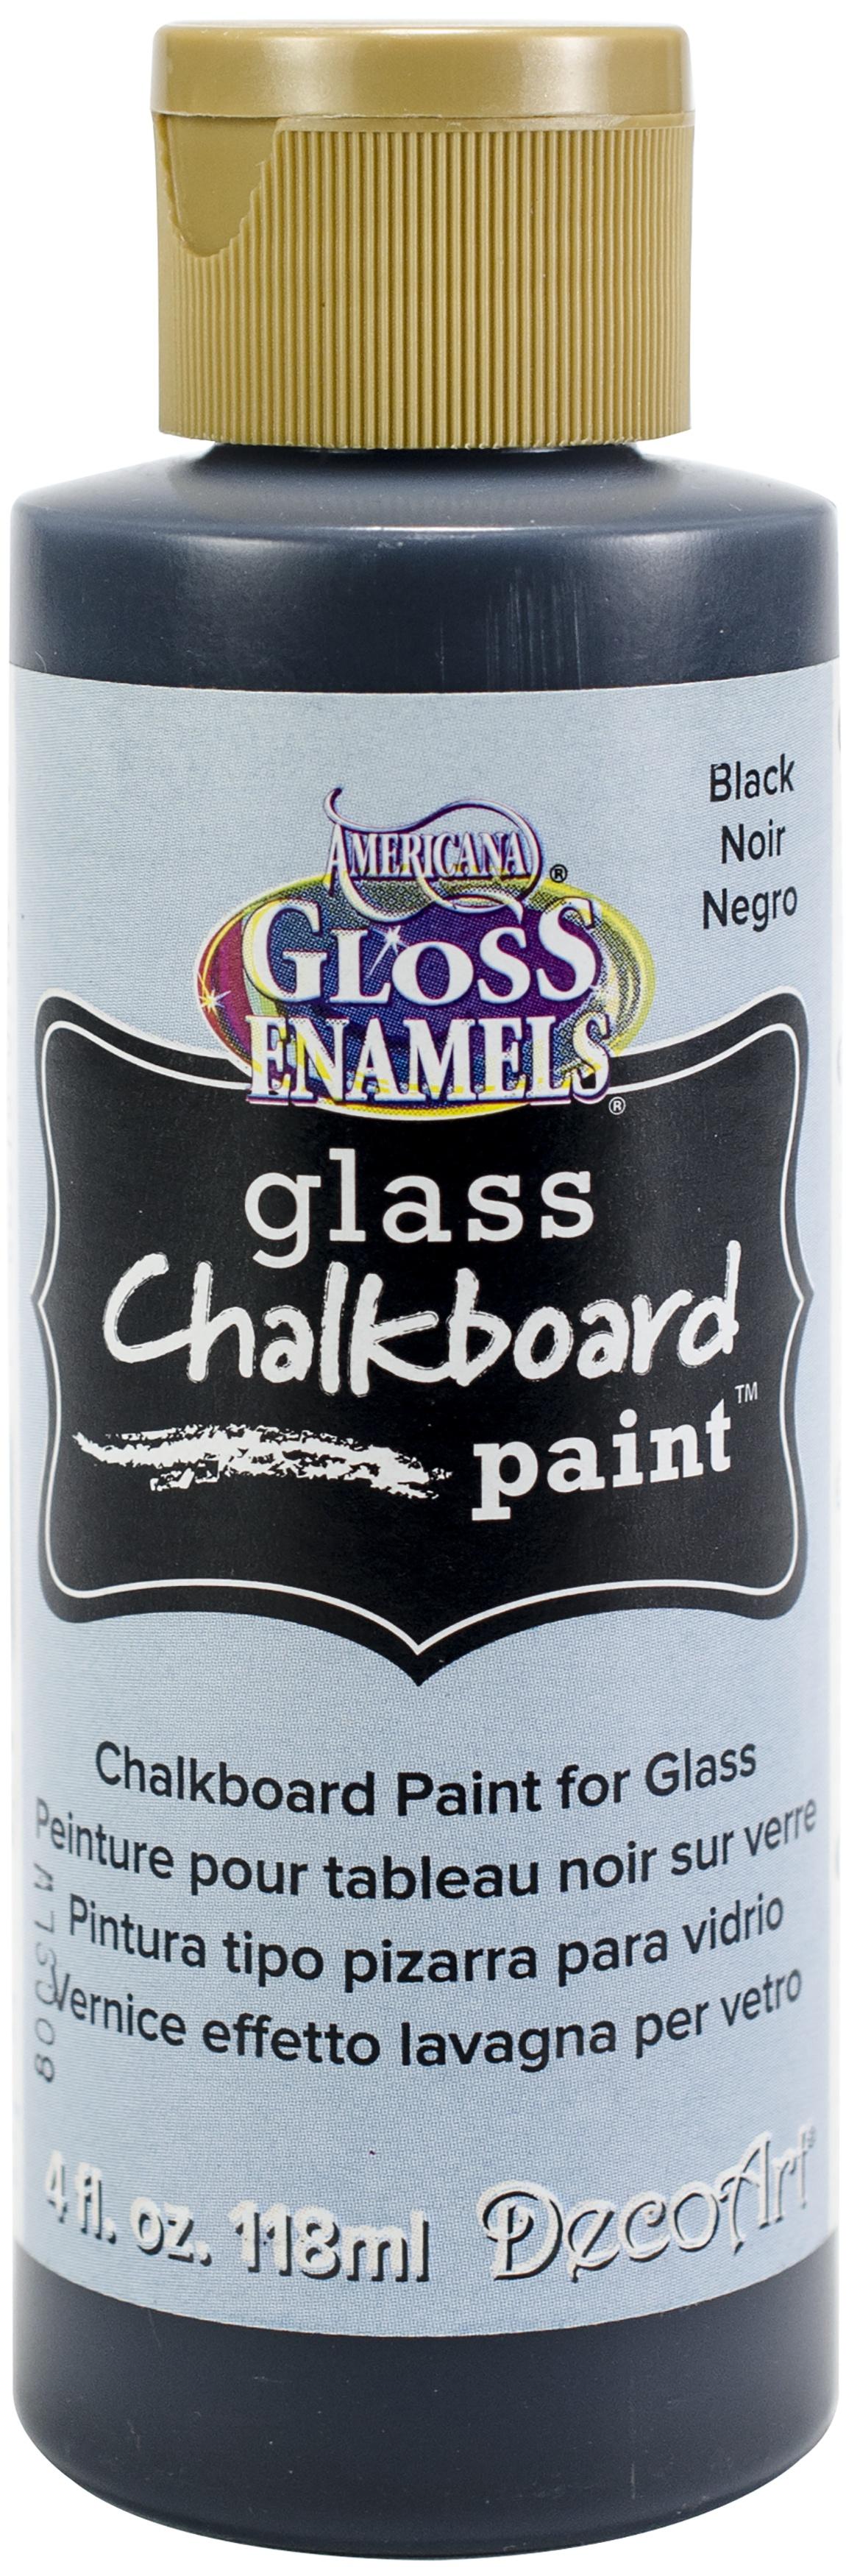 Americana Gloss Enamels Glass Chalkboard Paint 4oz-Black